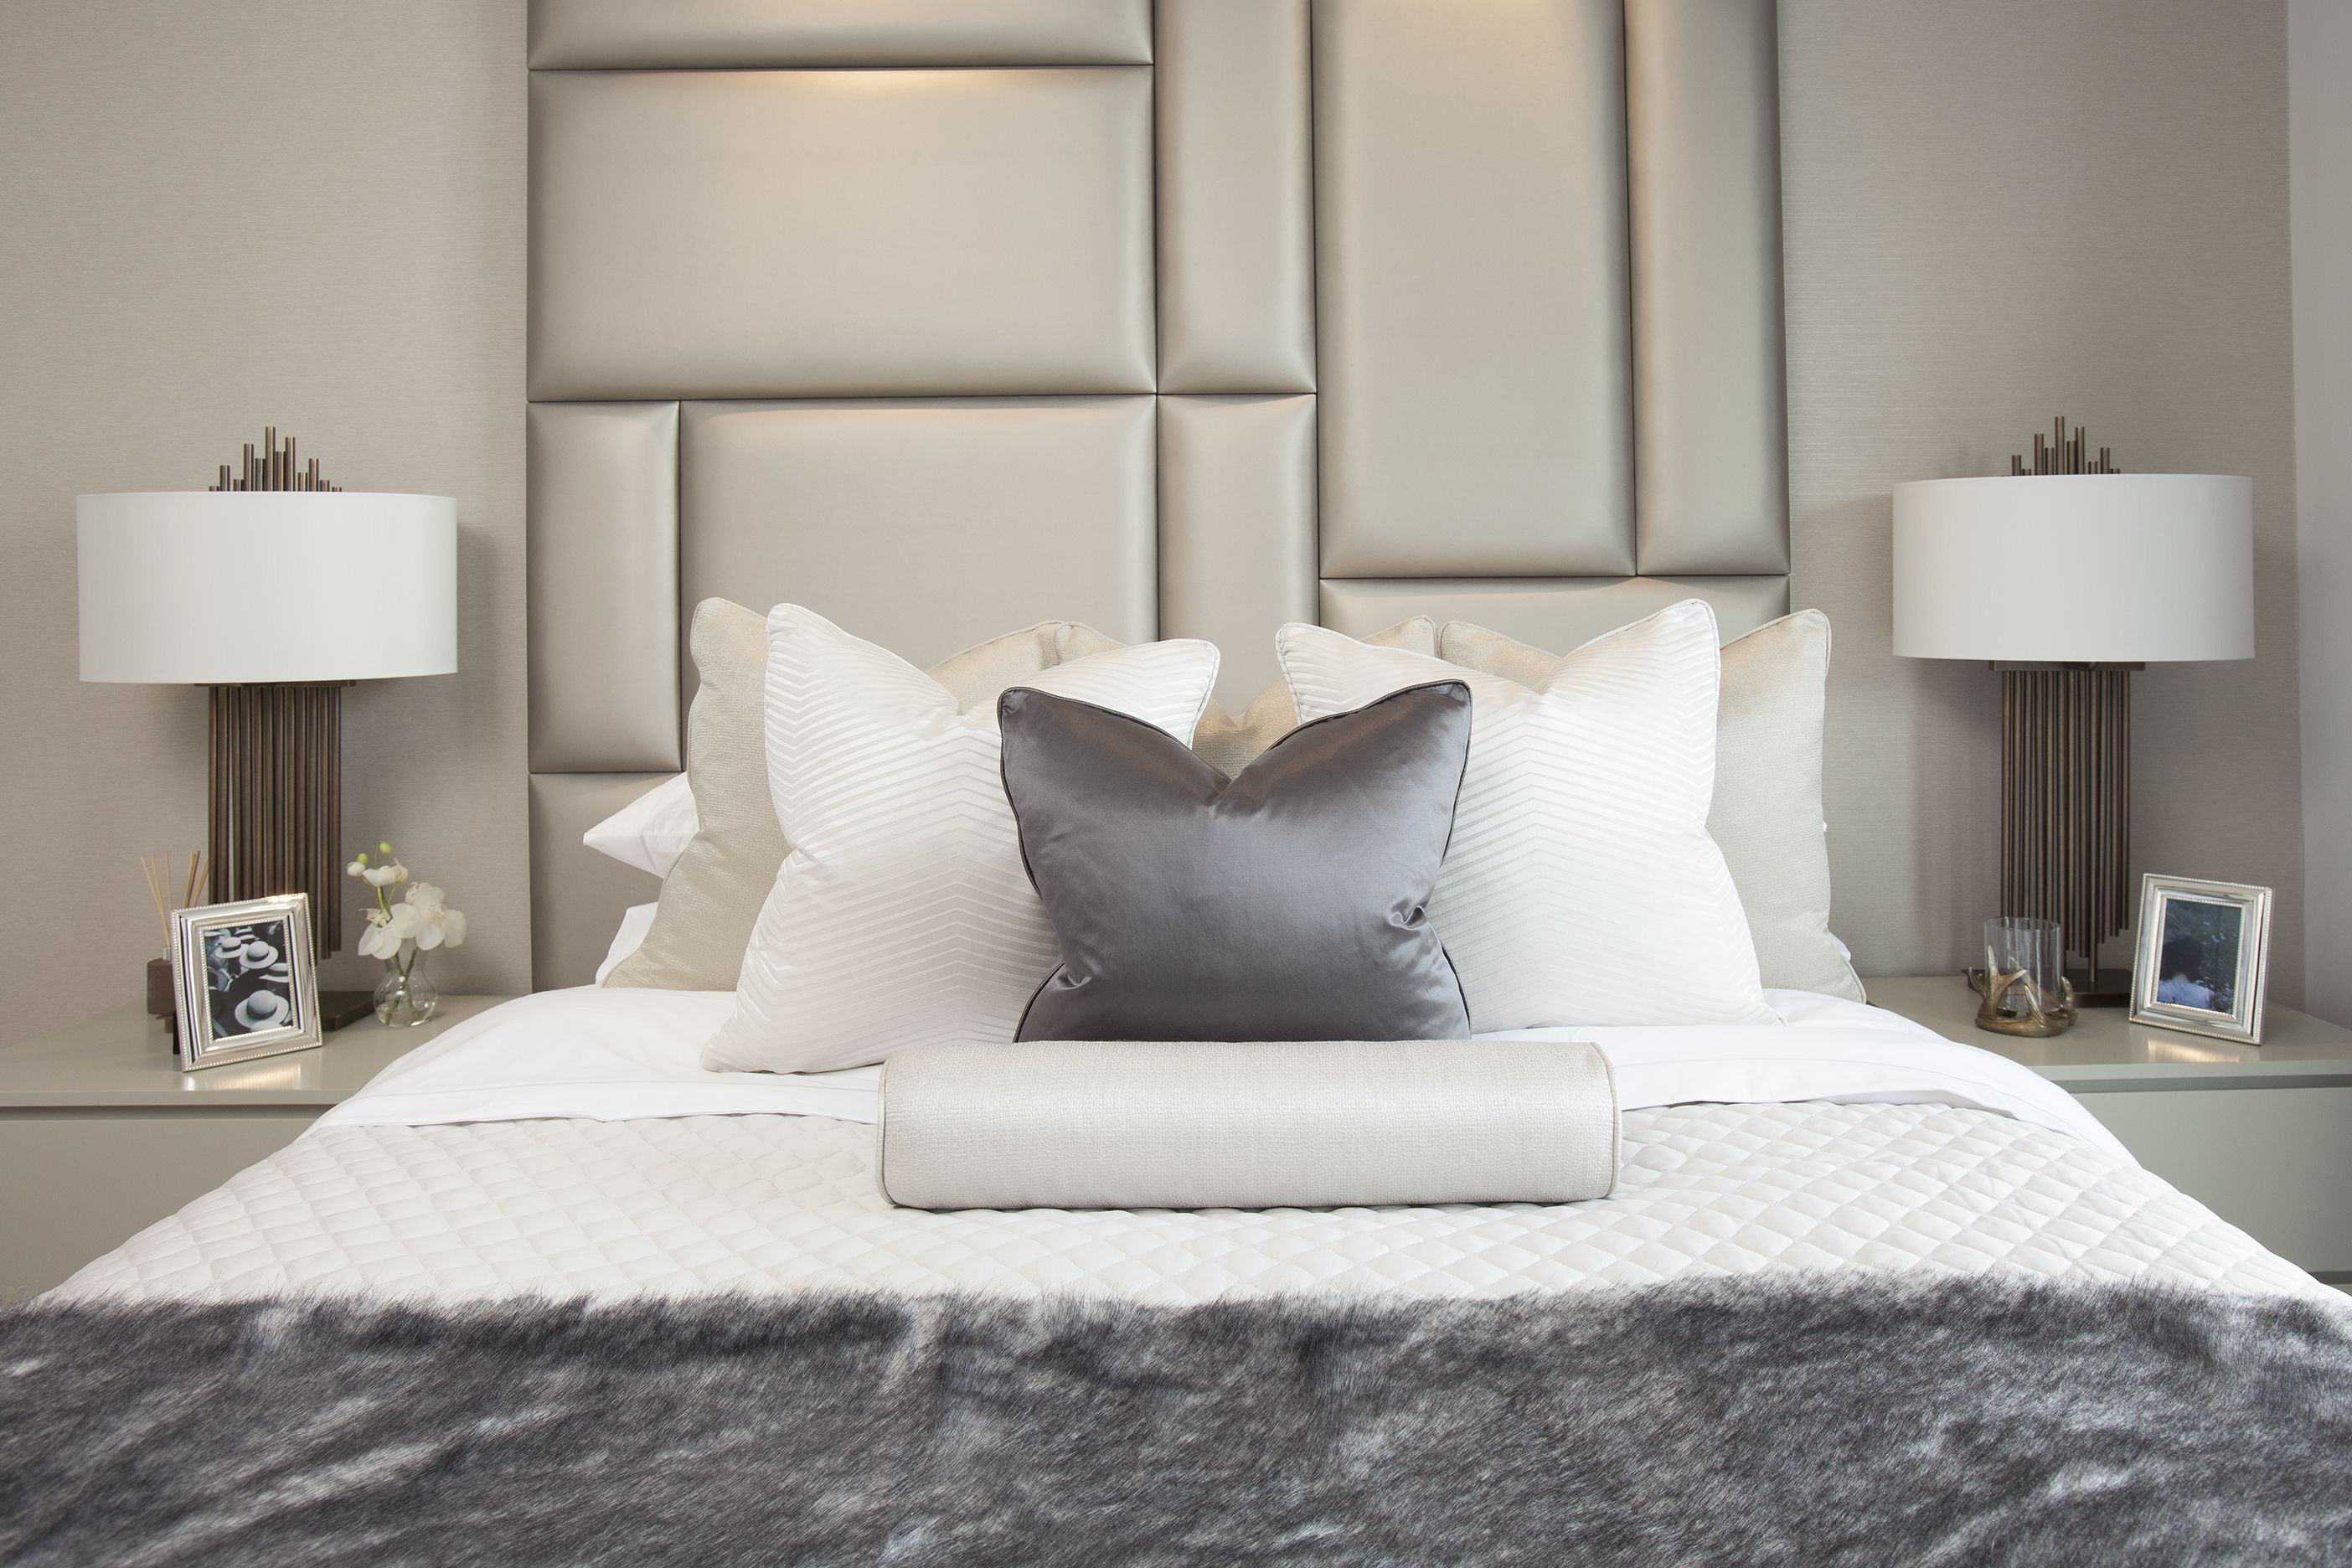 Best Master Bedroom Bespoke Feature Headboard Designed By Jhr 400 x 300